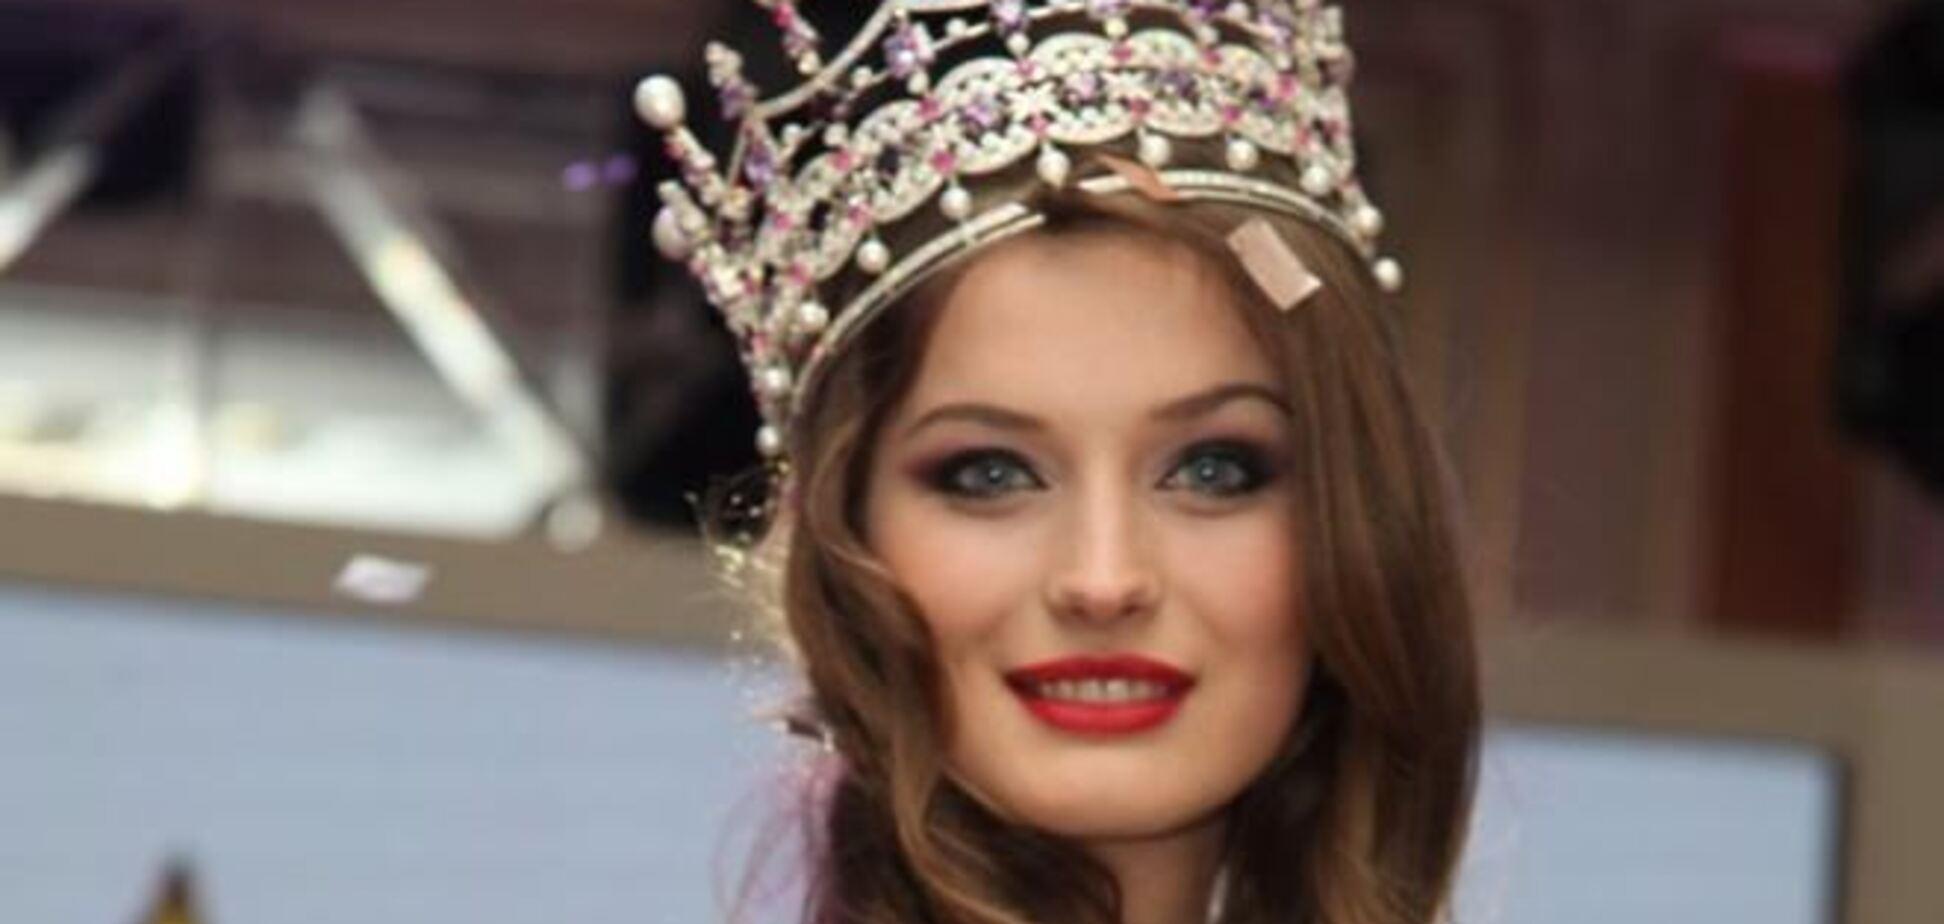 'Мисс Украина' ночует на Майдане вместе с митингующими